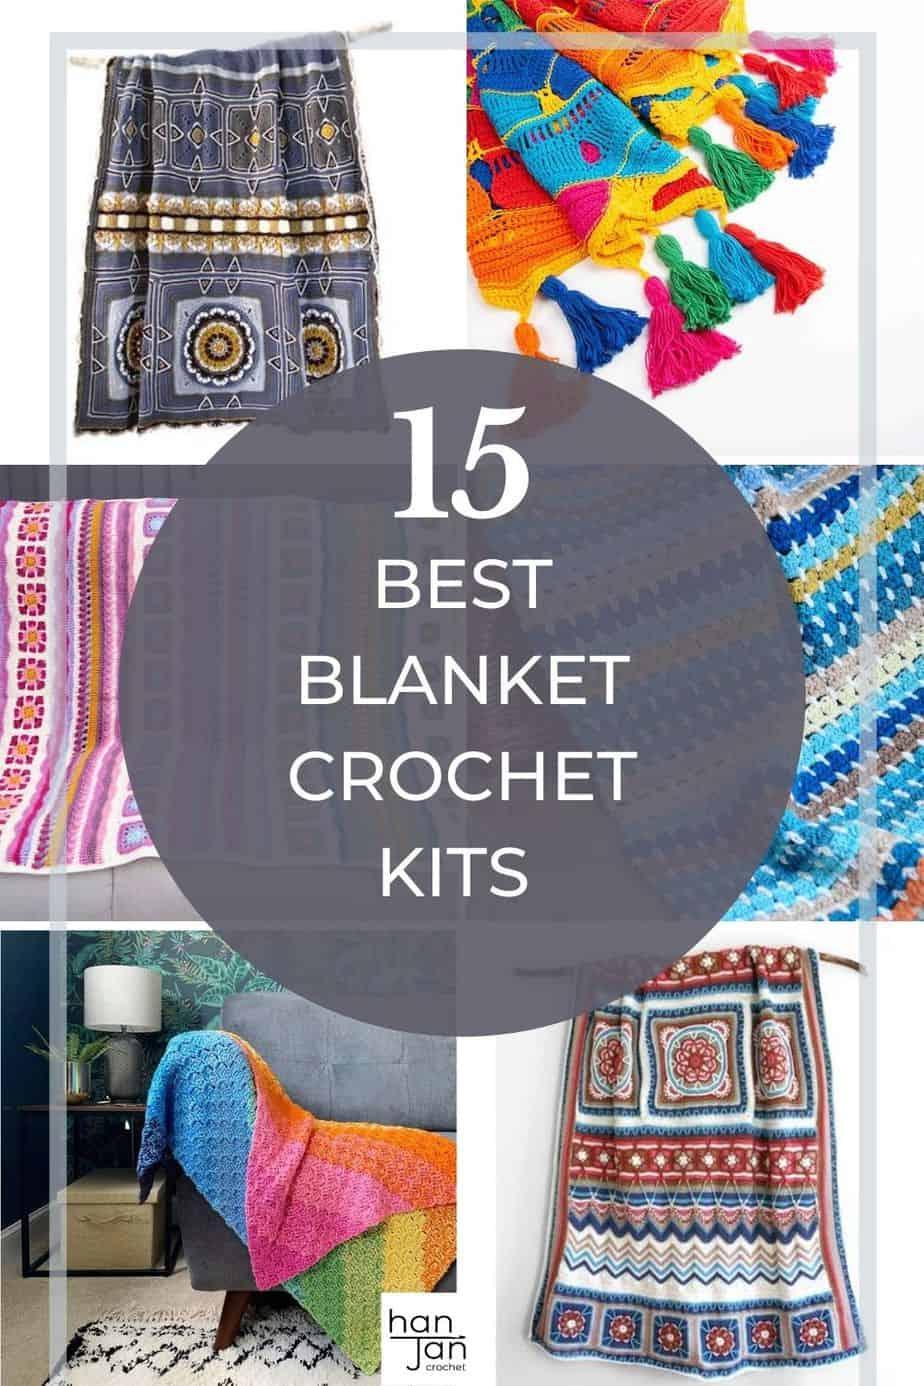 15 Best Blanket Crochet Kits for beginners and beyond 3